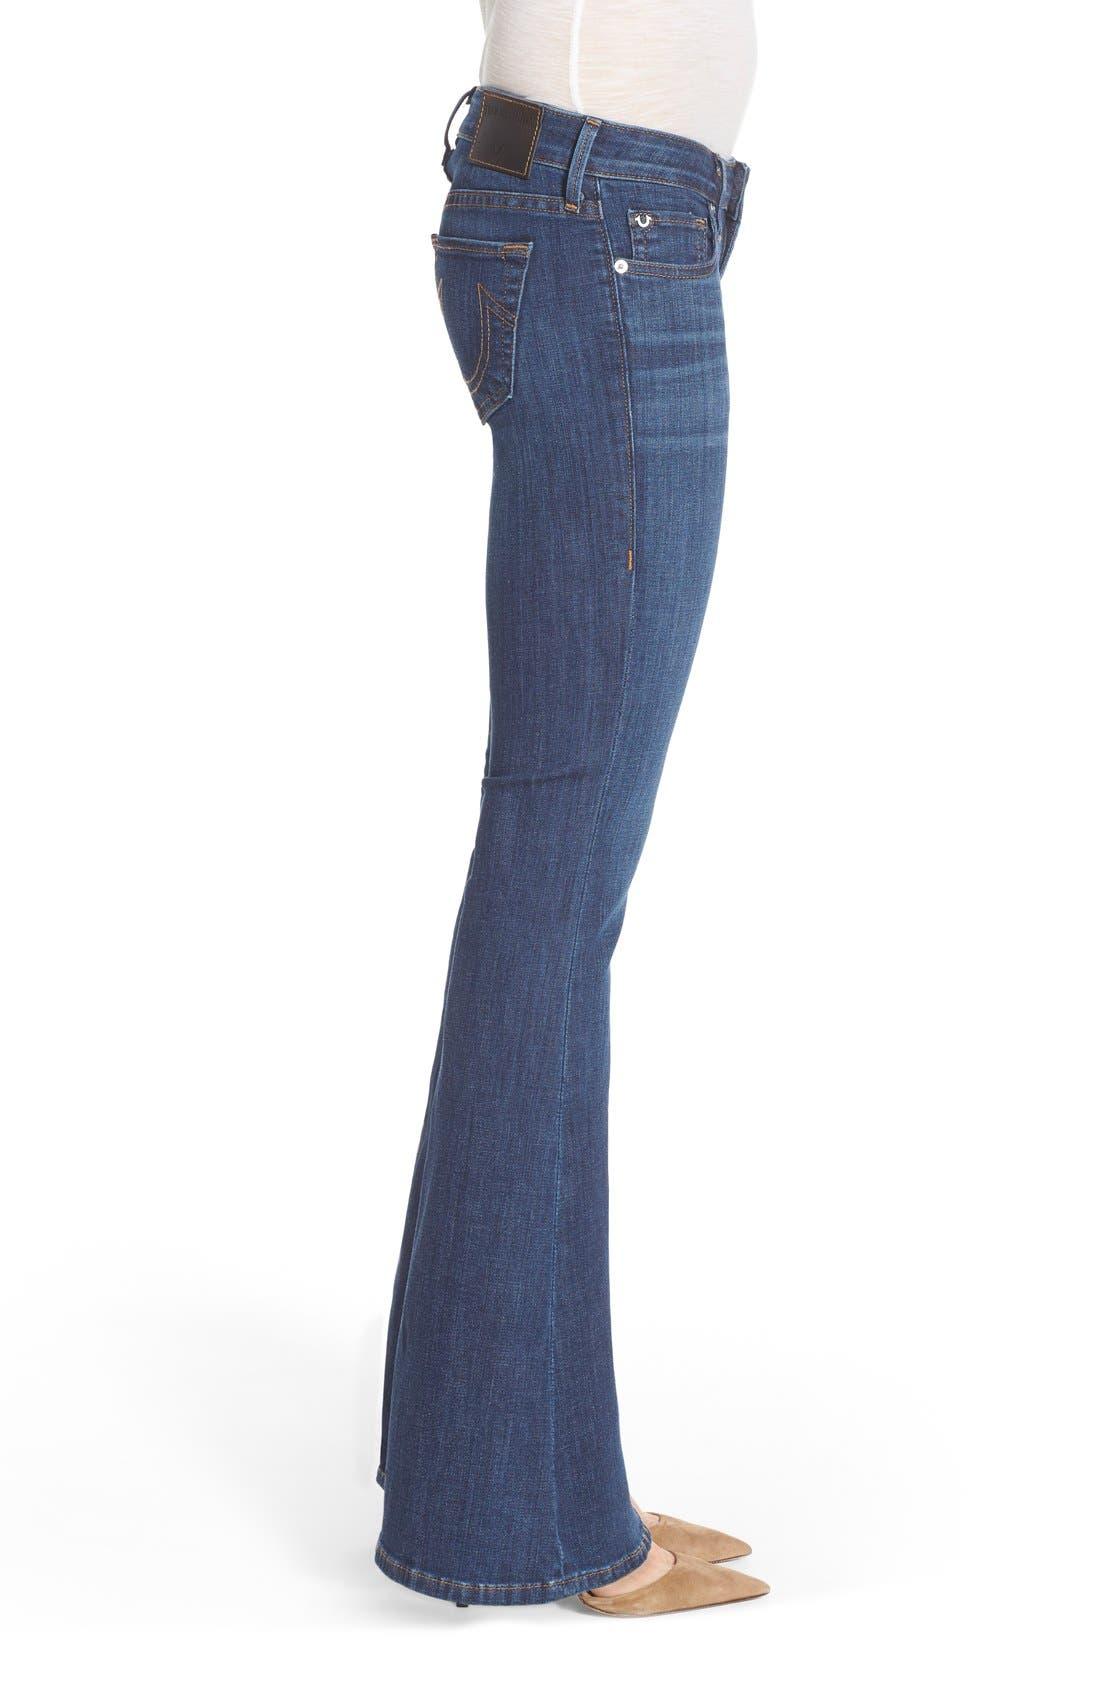 Alternate Image 3  - True Religion Brand Jeans 'Karlie' Bell Bottom Jeans (Worn Vintage)